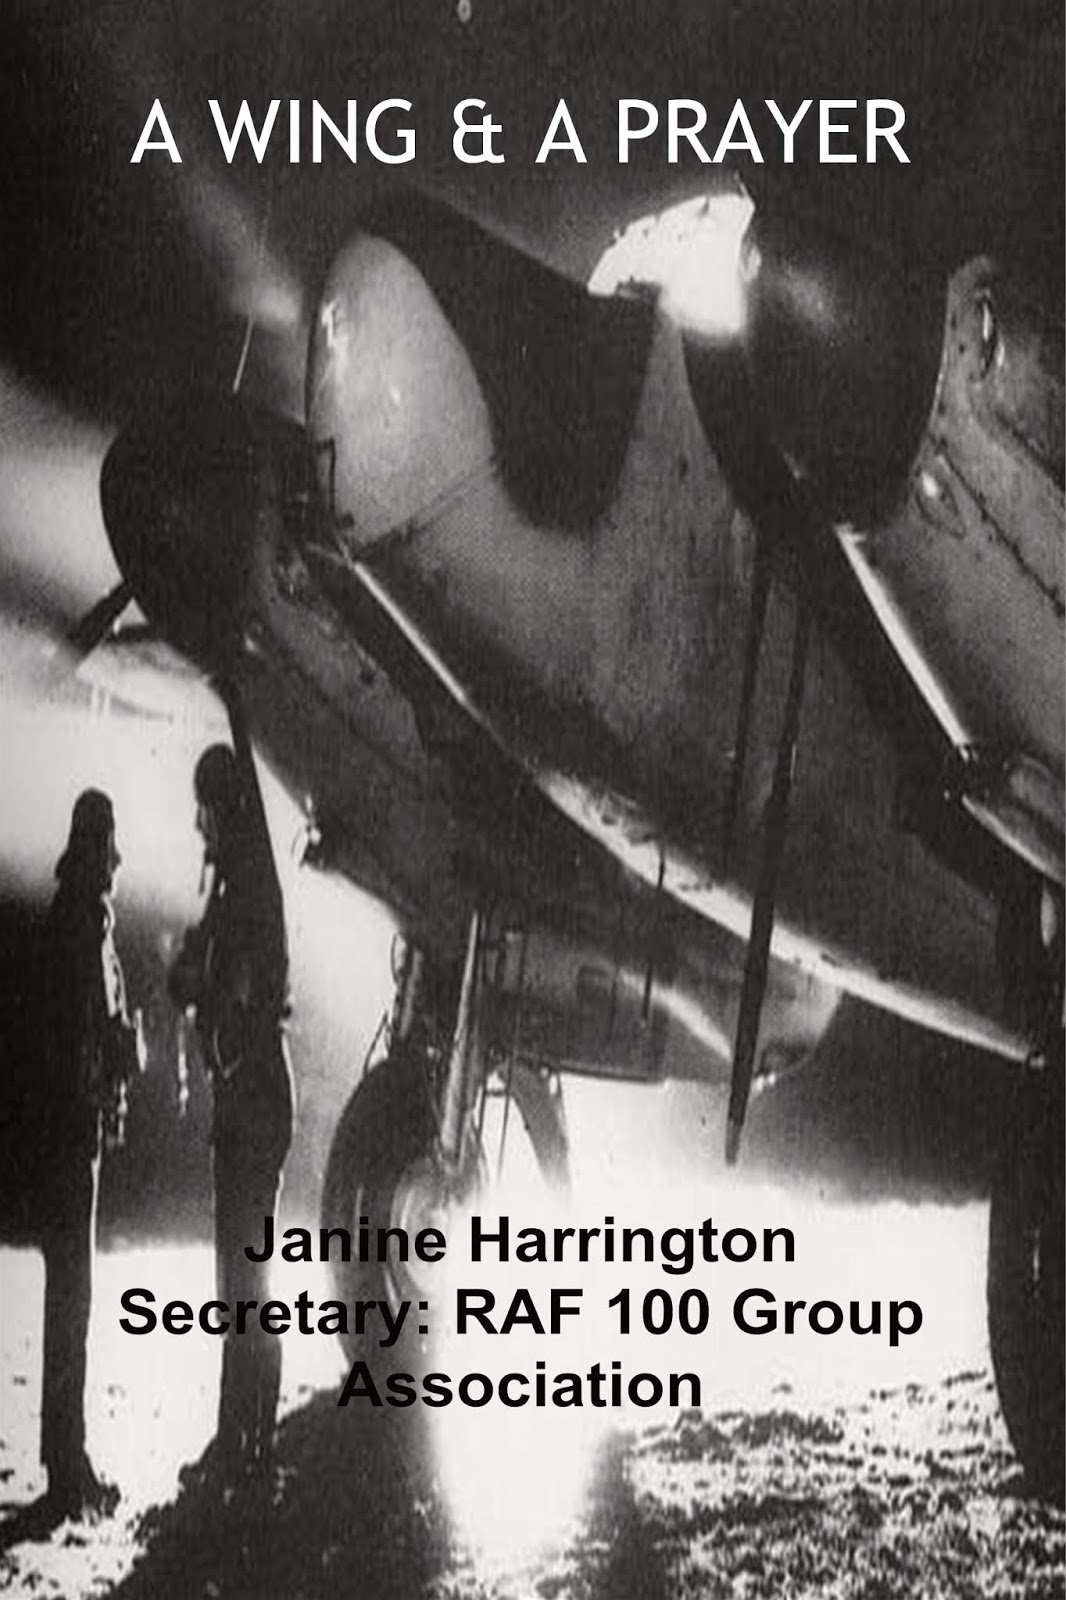 AUTHOR: Janine Harrington